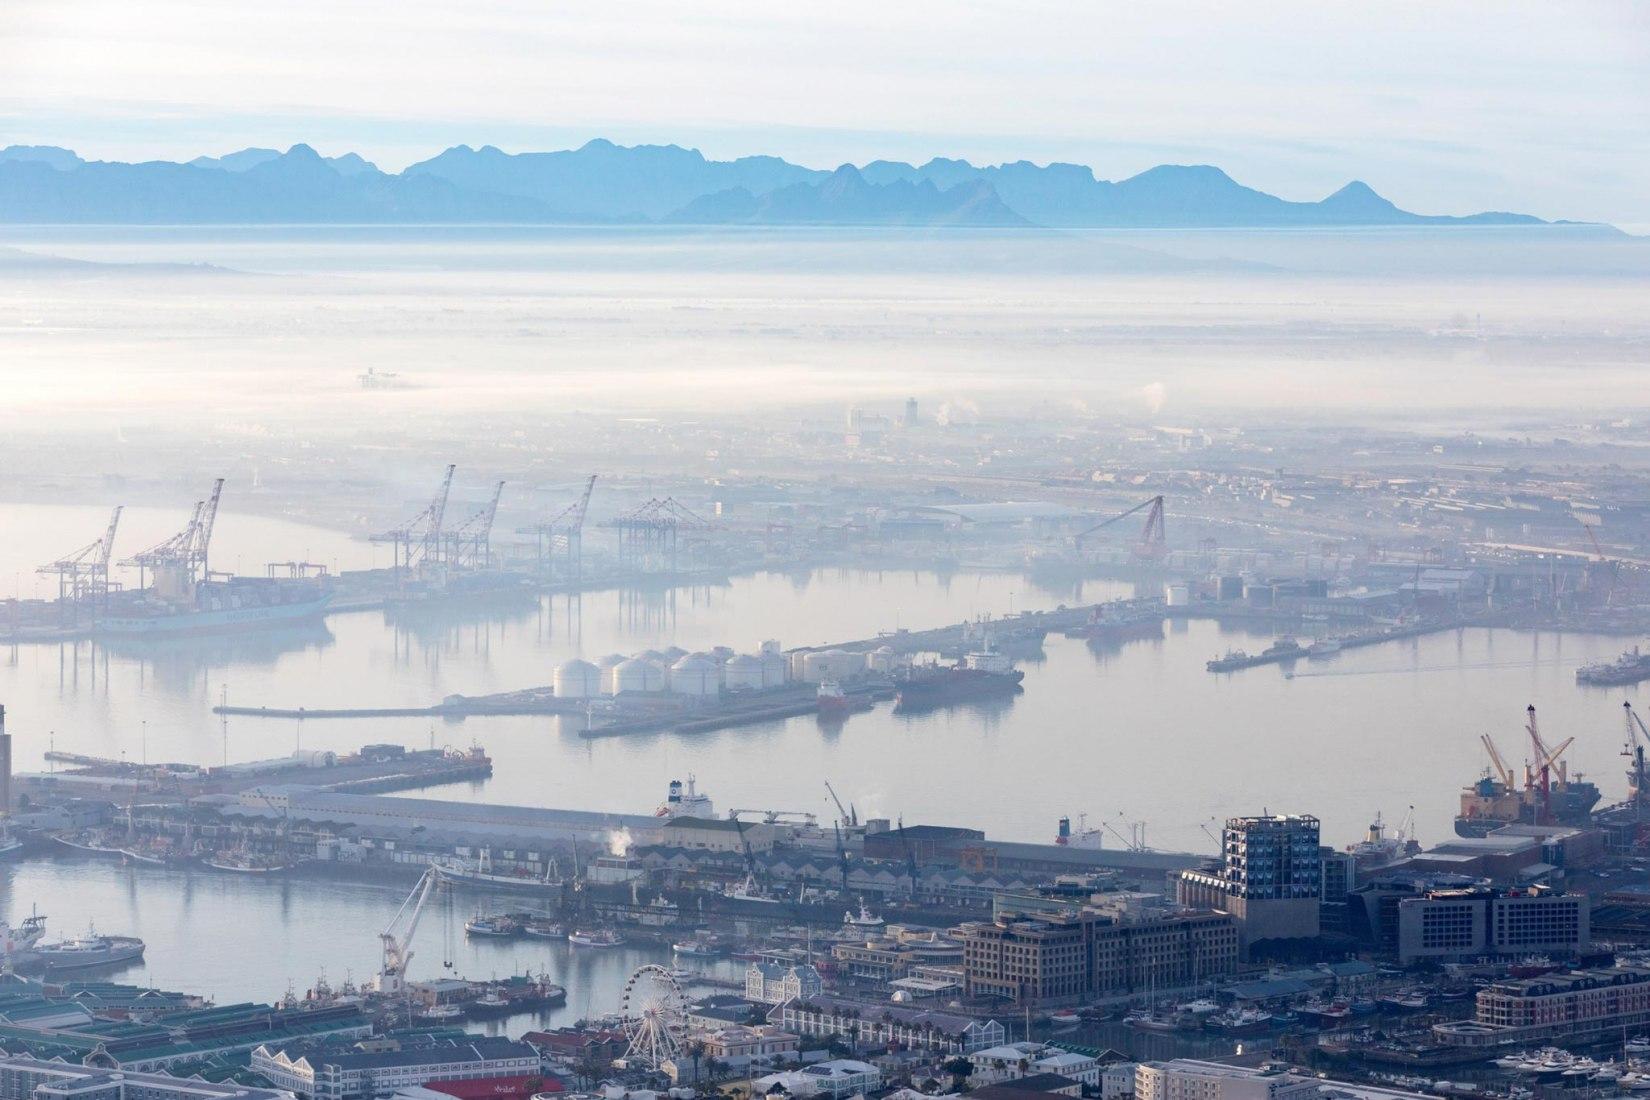 Cape Town overview. Zeitz MOCAA by Thomas Heatherwick. Photograph © Iwan Baan